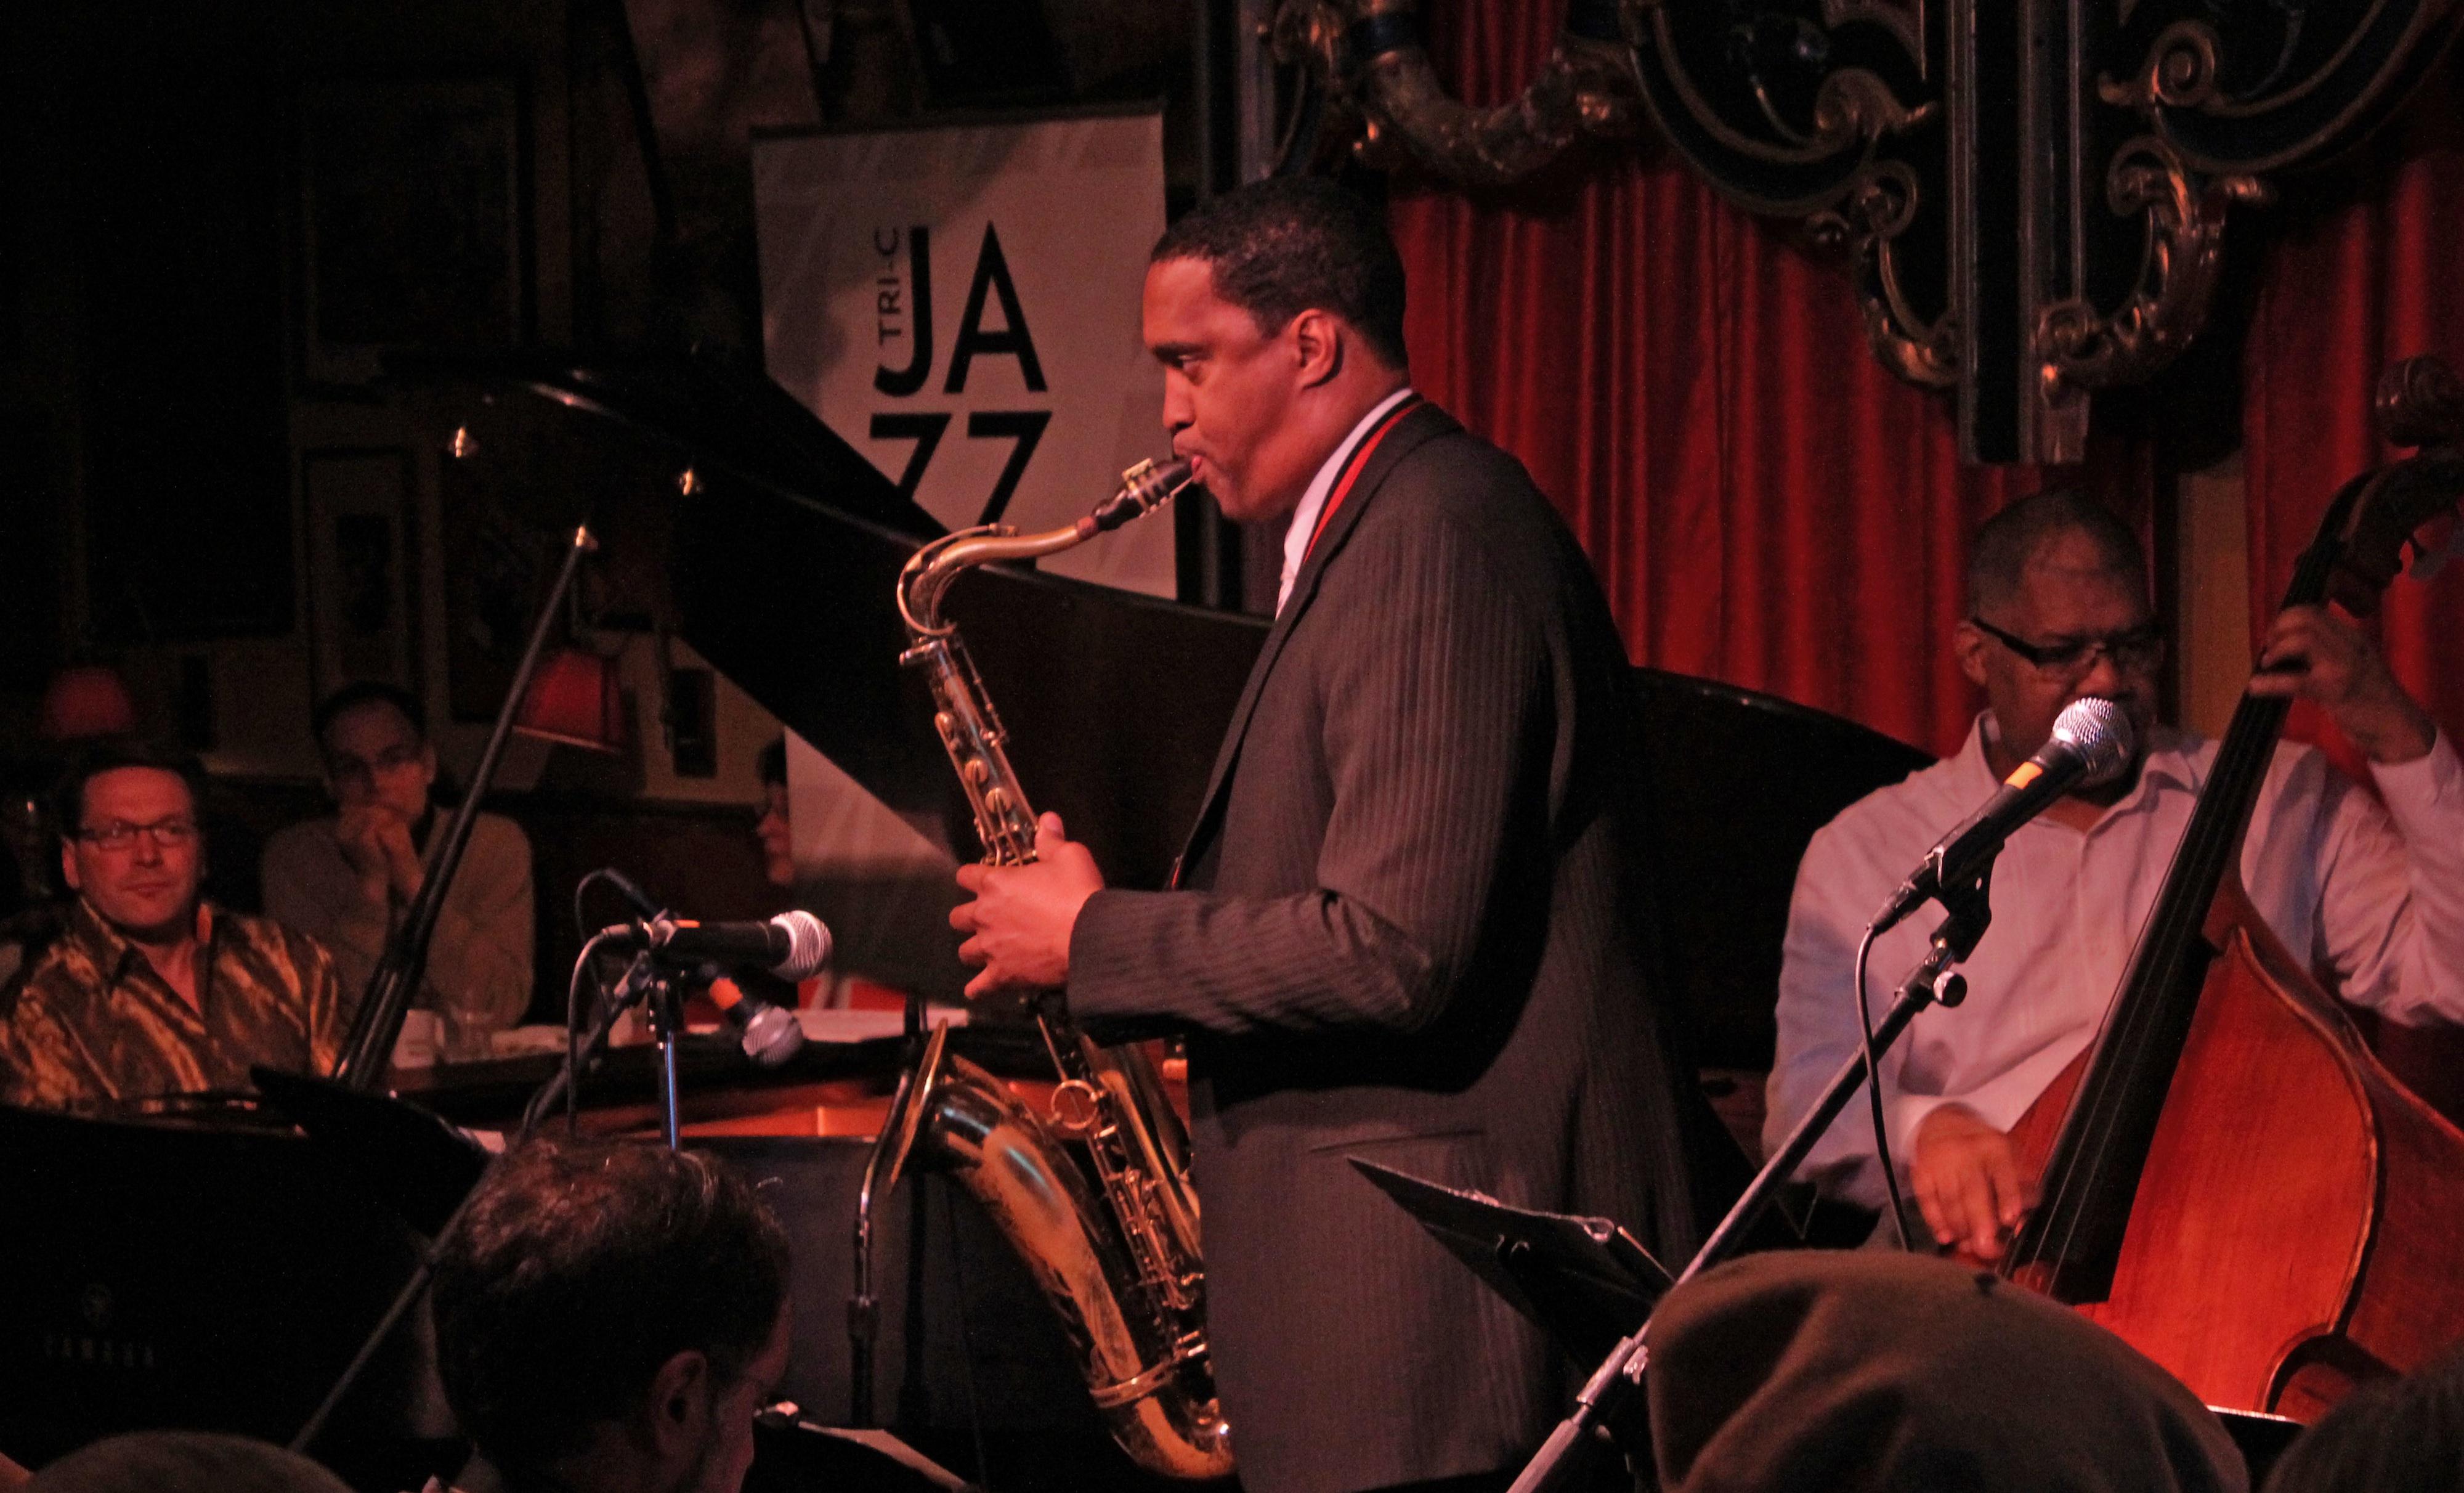 Chip stephens, javon jackson and glenn holmes at tri-c jazzfest cleveland 2013